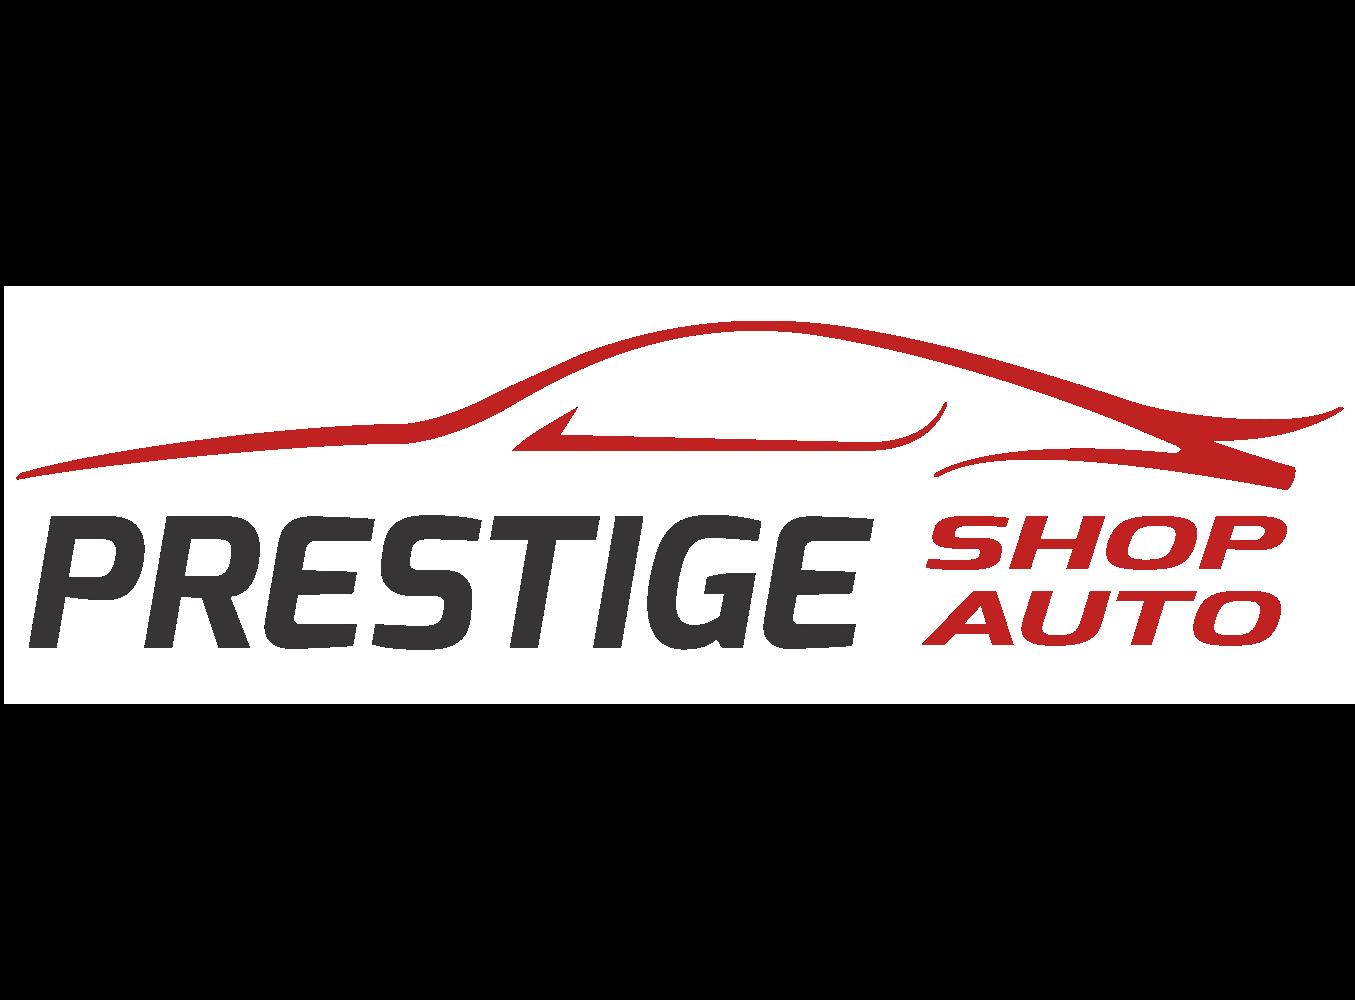 Logo PrestigeShopAuto